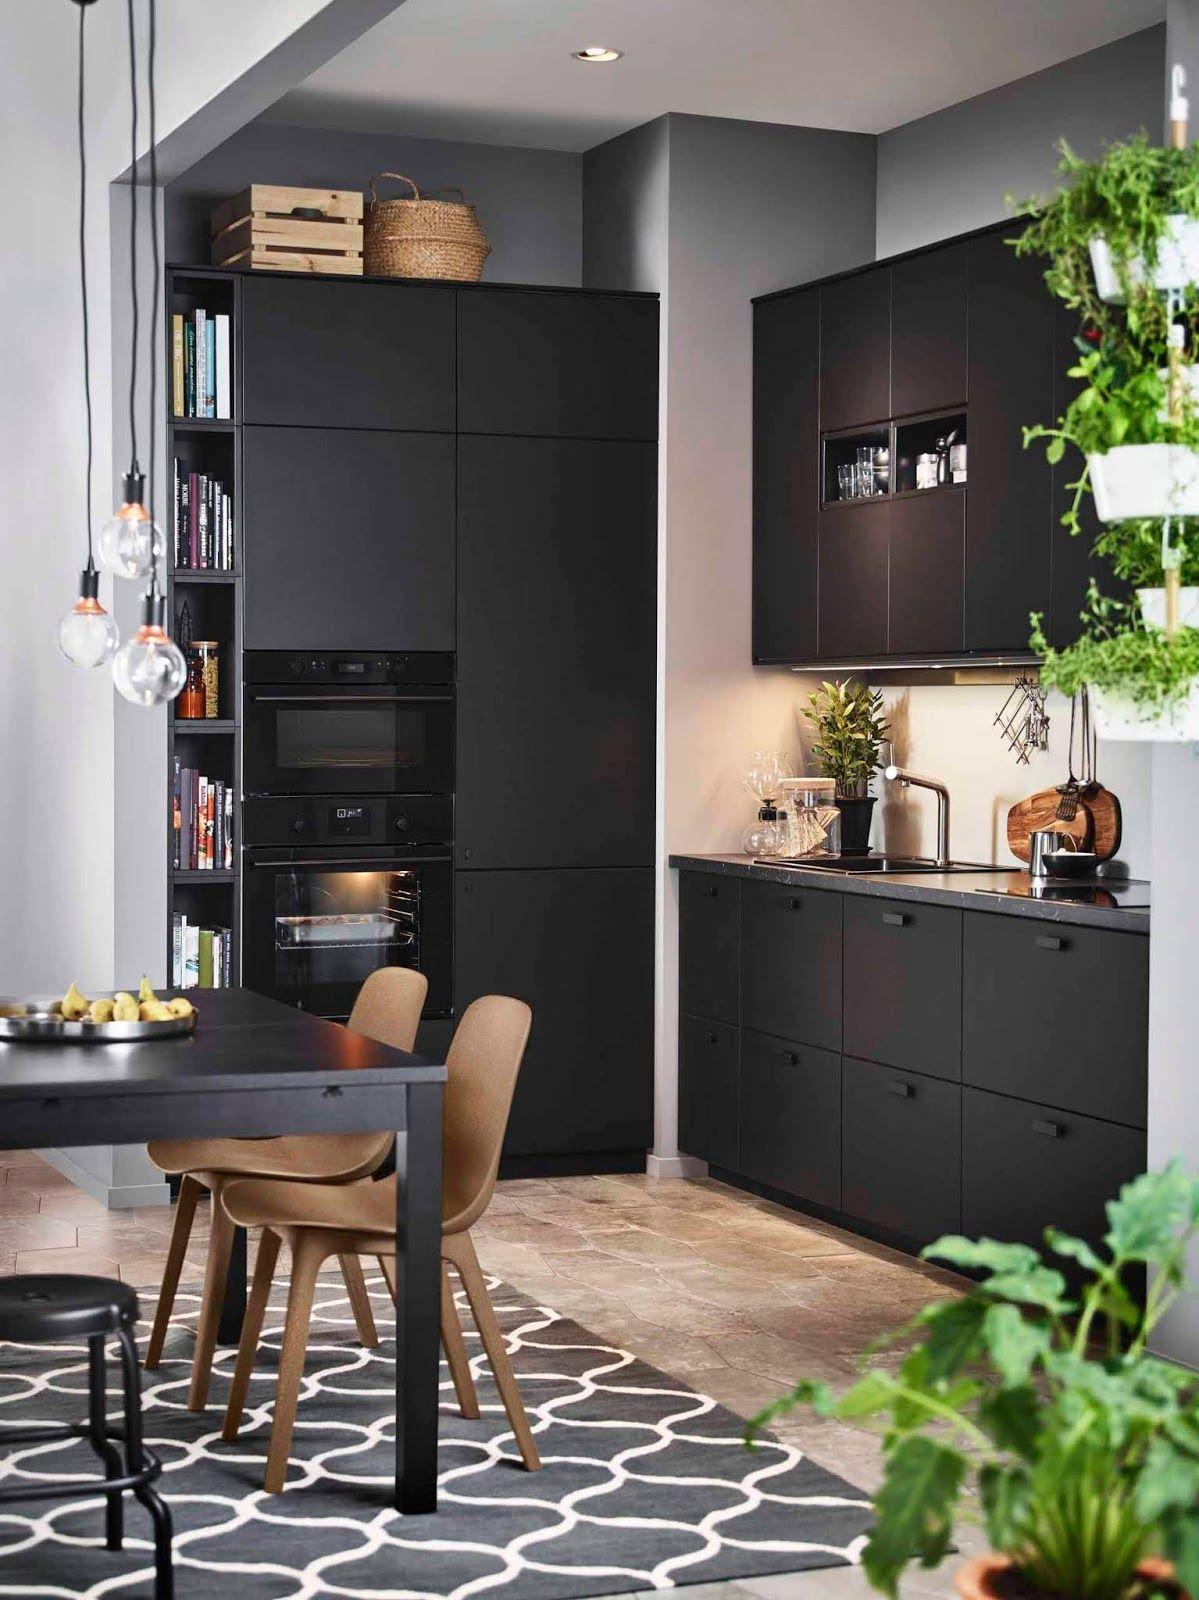 30 Modern Kitchen Interior Ideas To Inspire You In 2019 Ikea